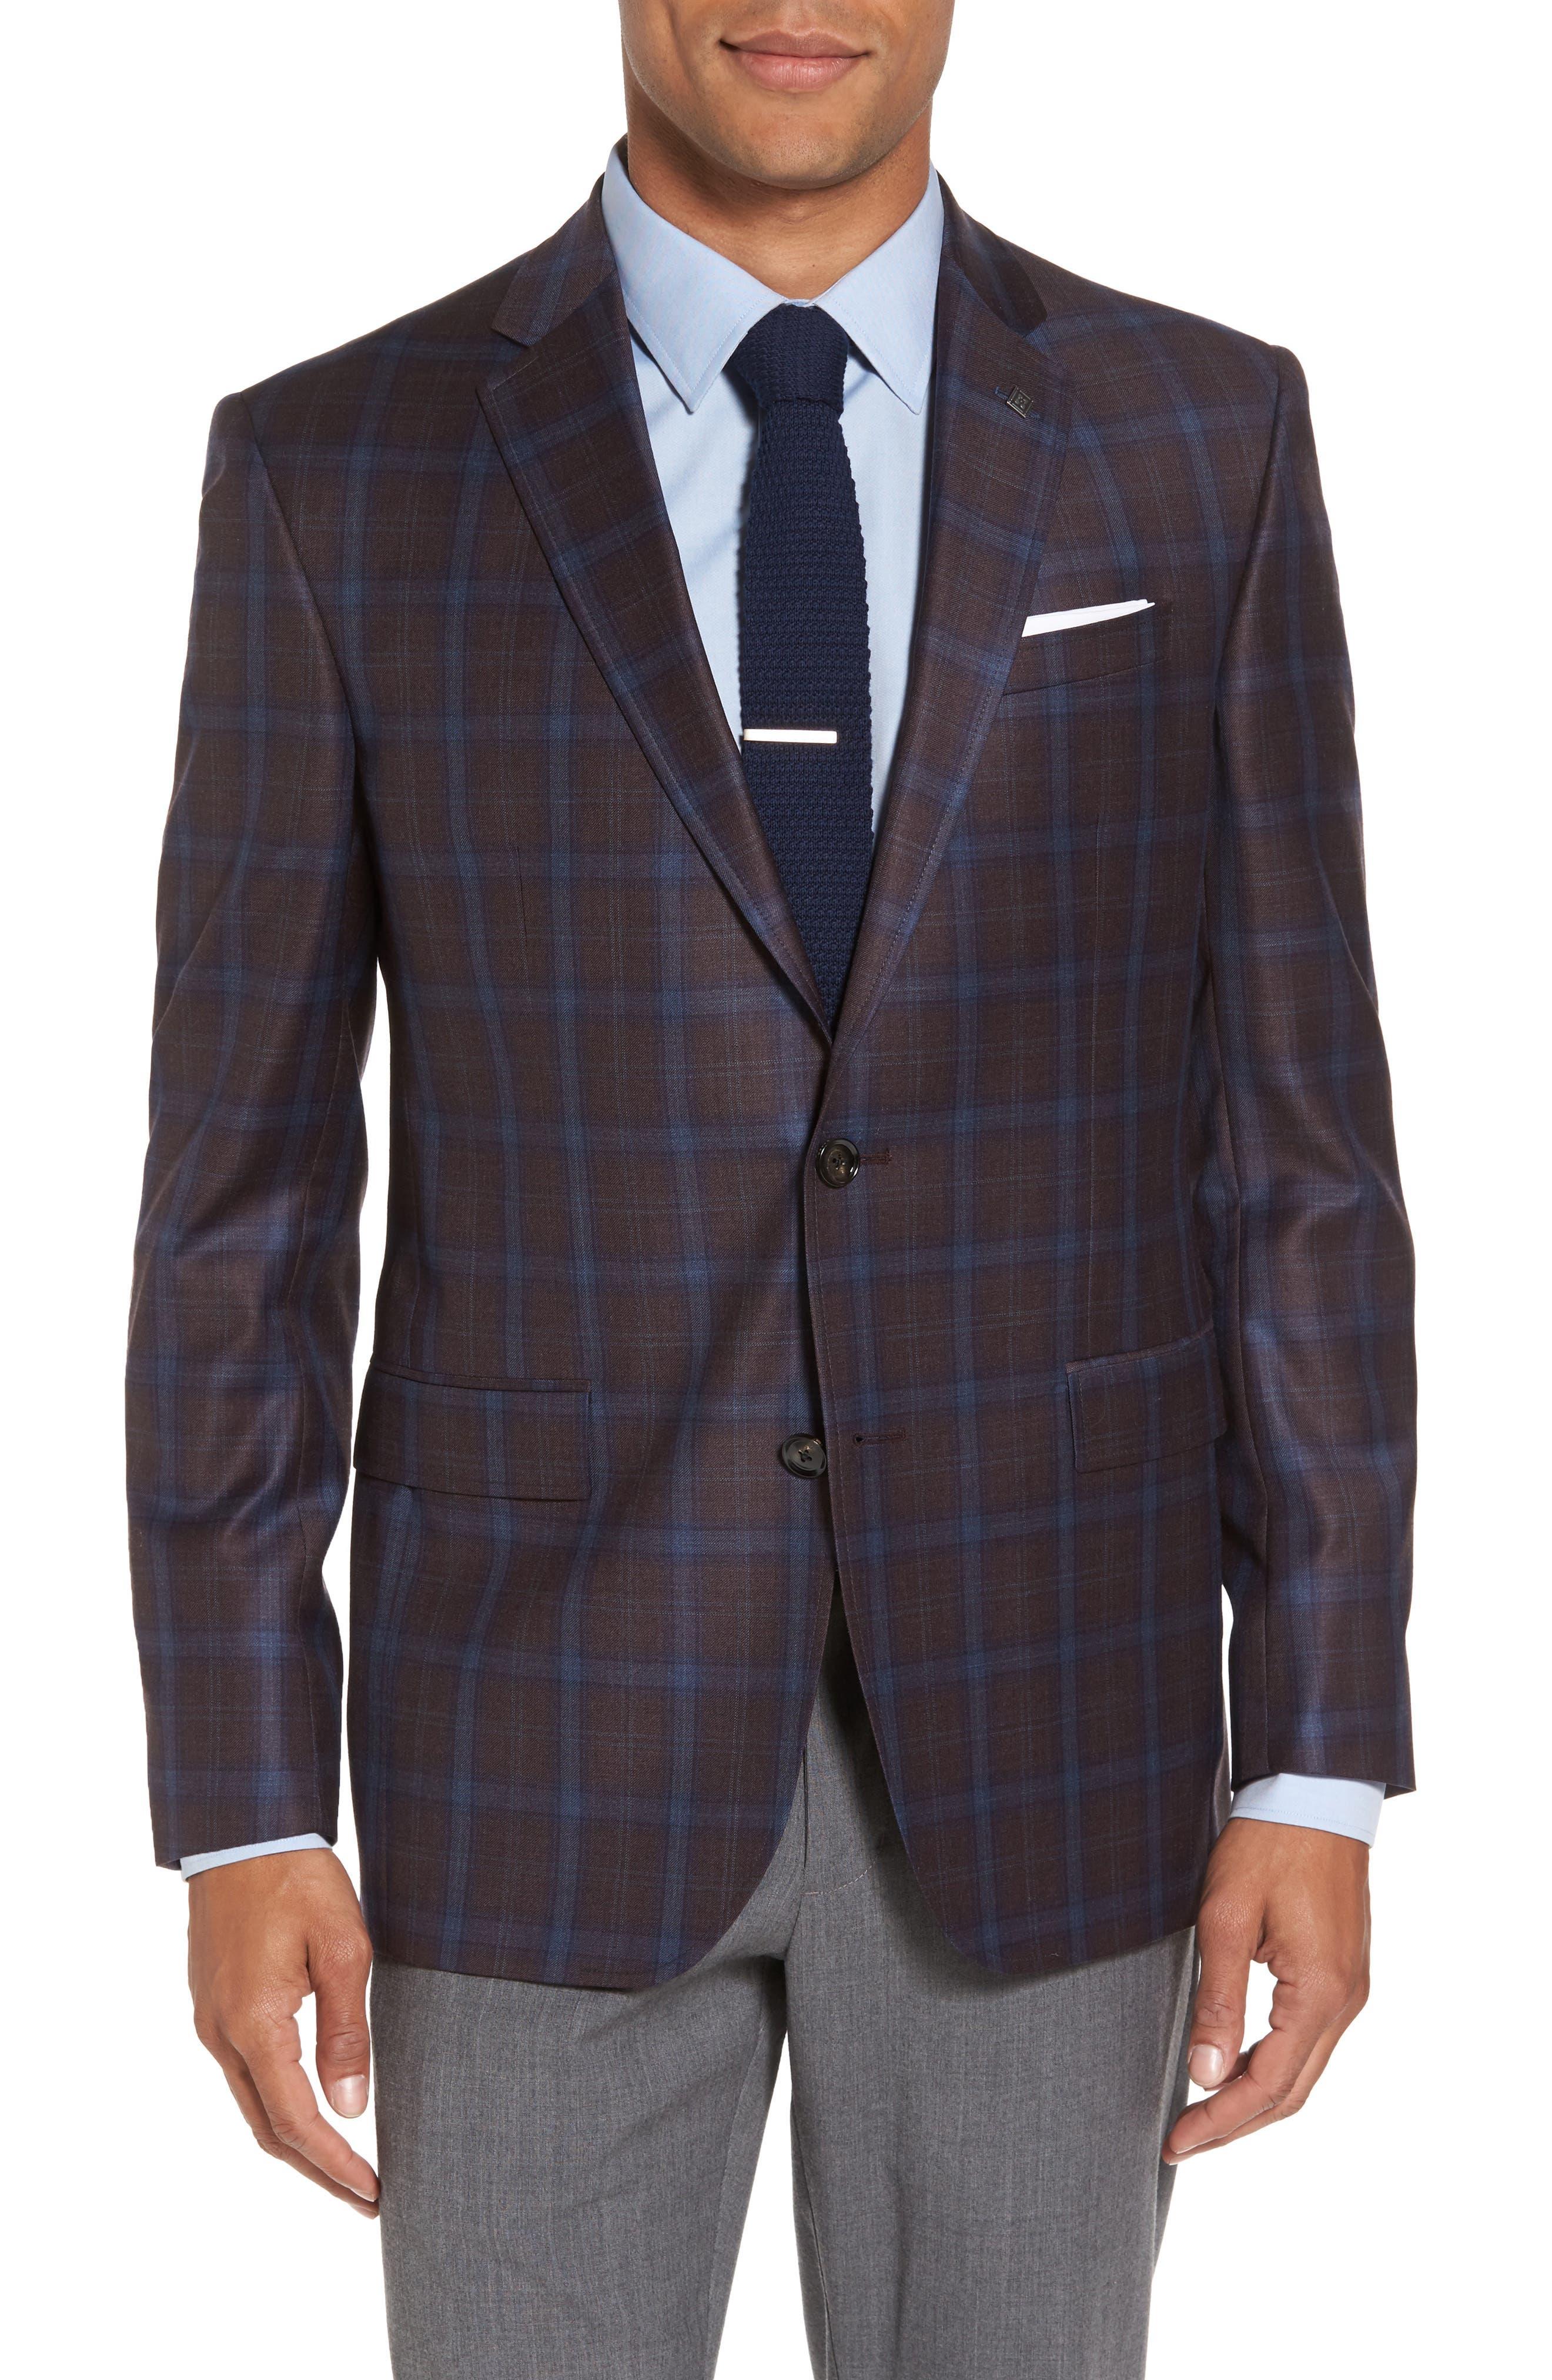 Jay Trim Fit Plaid Wool Sport Coat,                             Main thumbnail 1, color,                             932